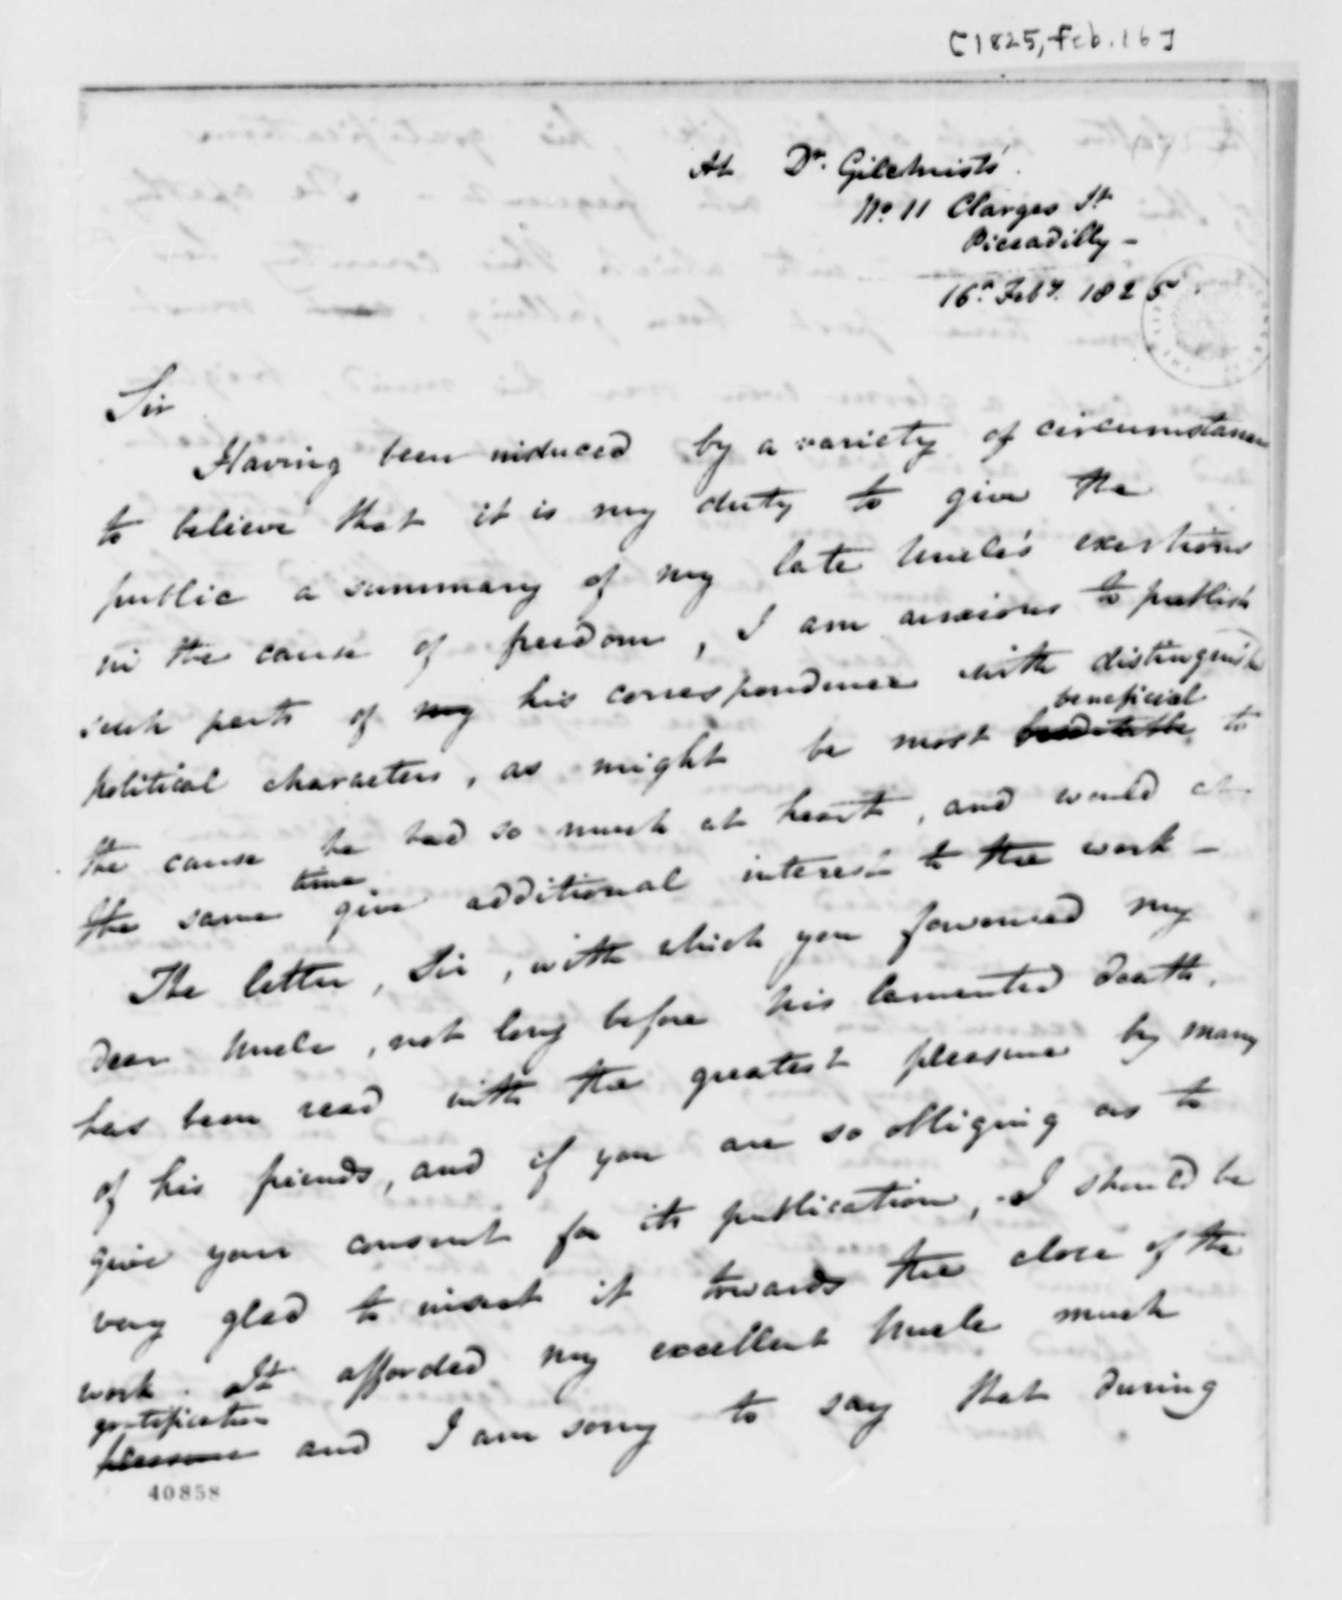 Frances D. Cartwright to Thomas Jefferson, February 16, 1825